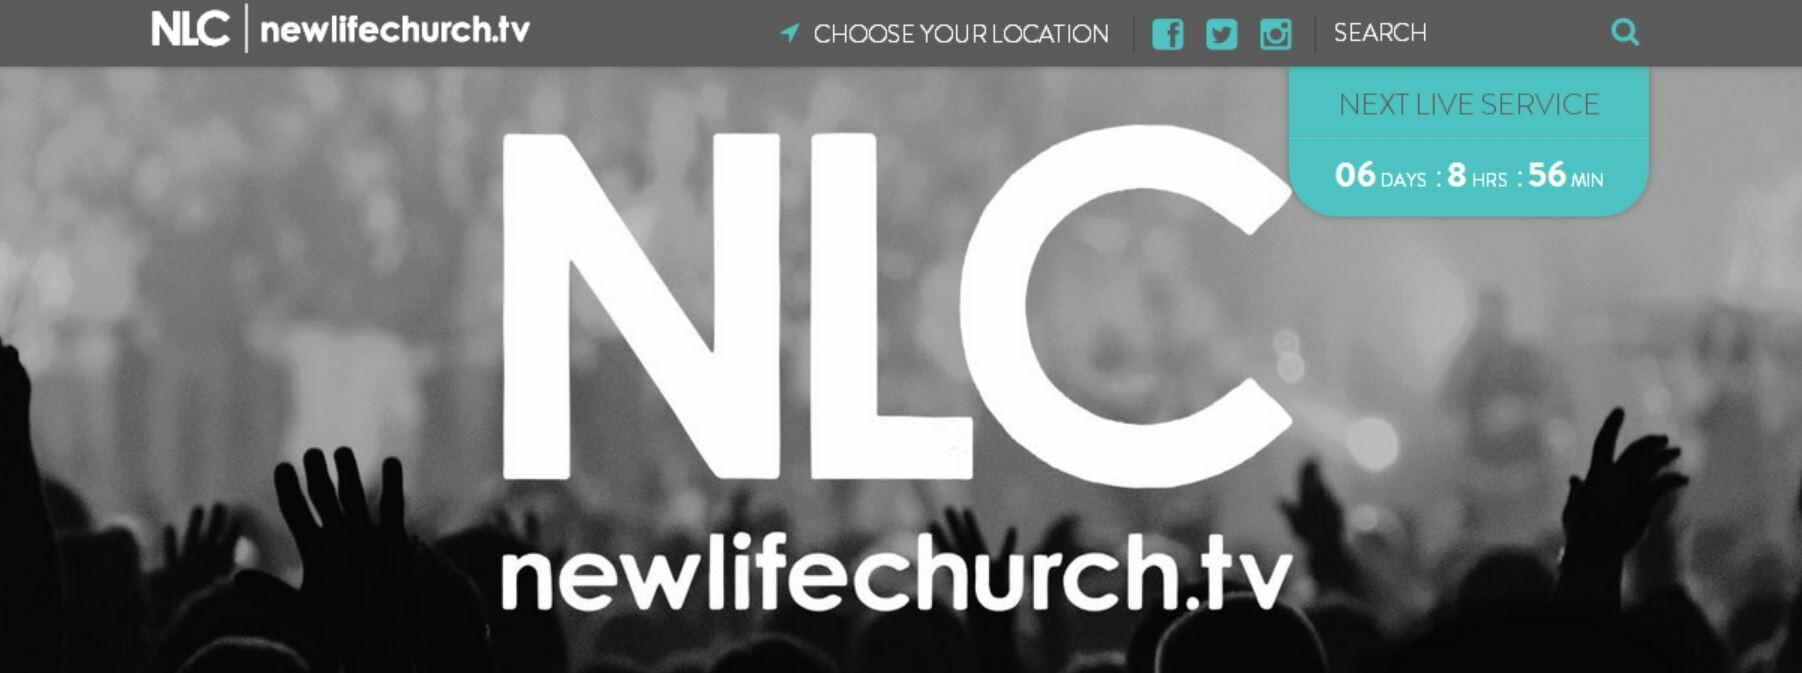 site-search-newlifechurch